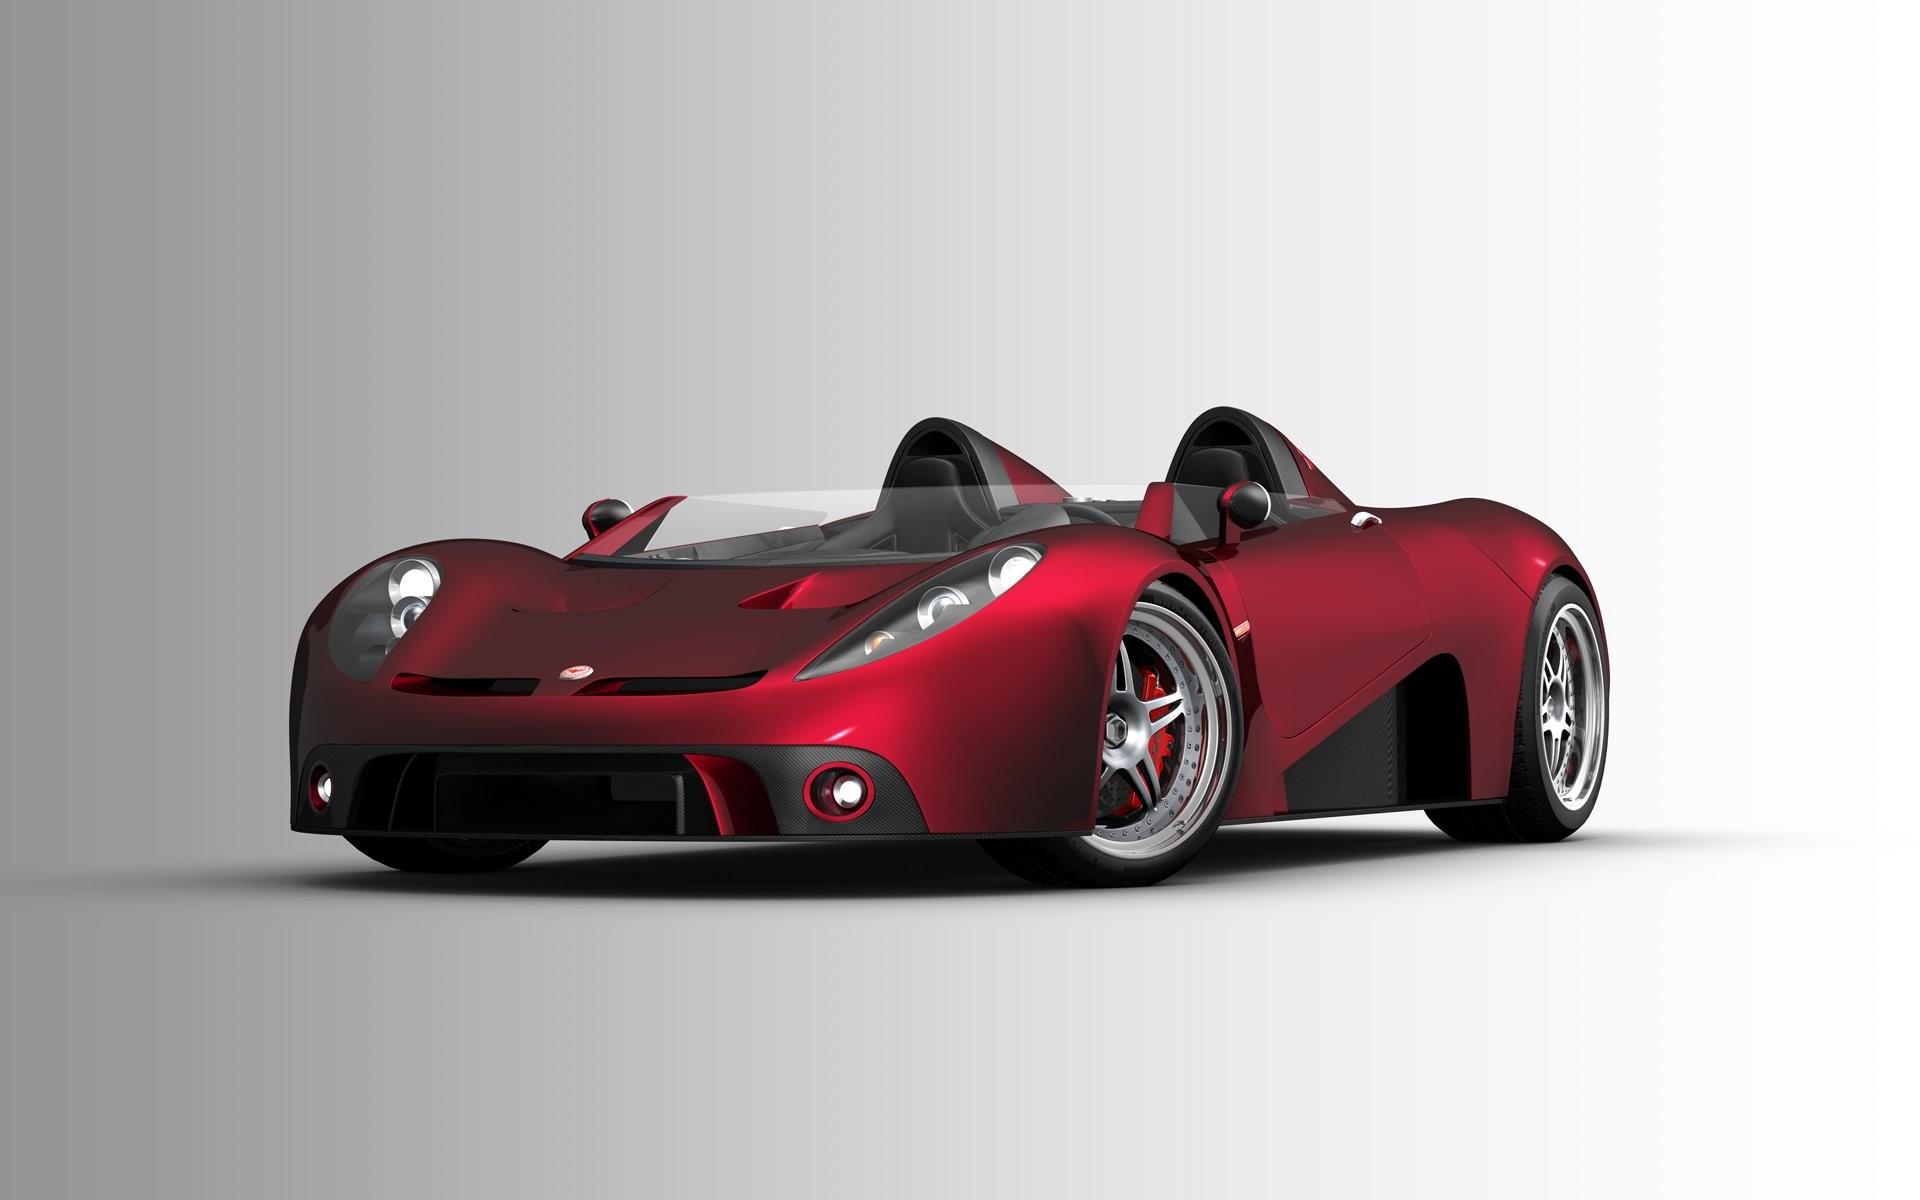 Wallpaper Red Sports Car Brand Performance Car